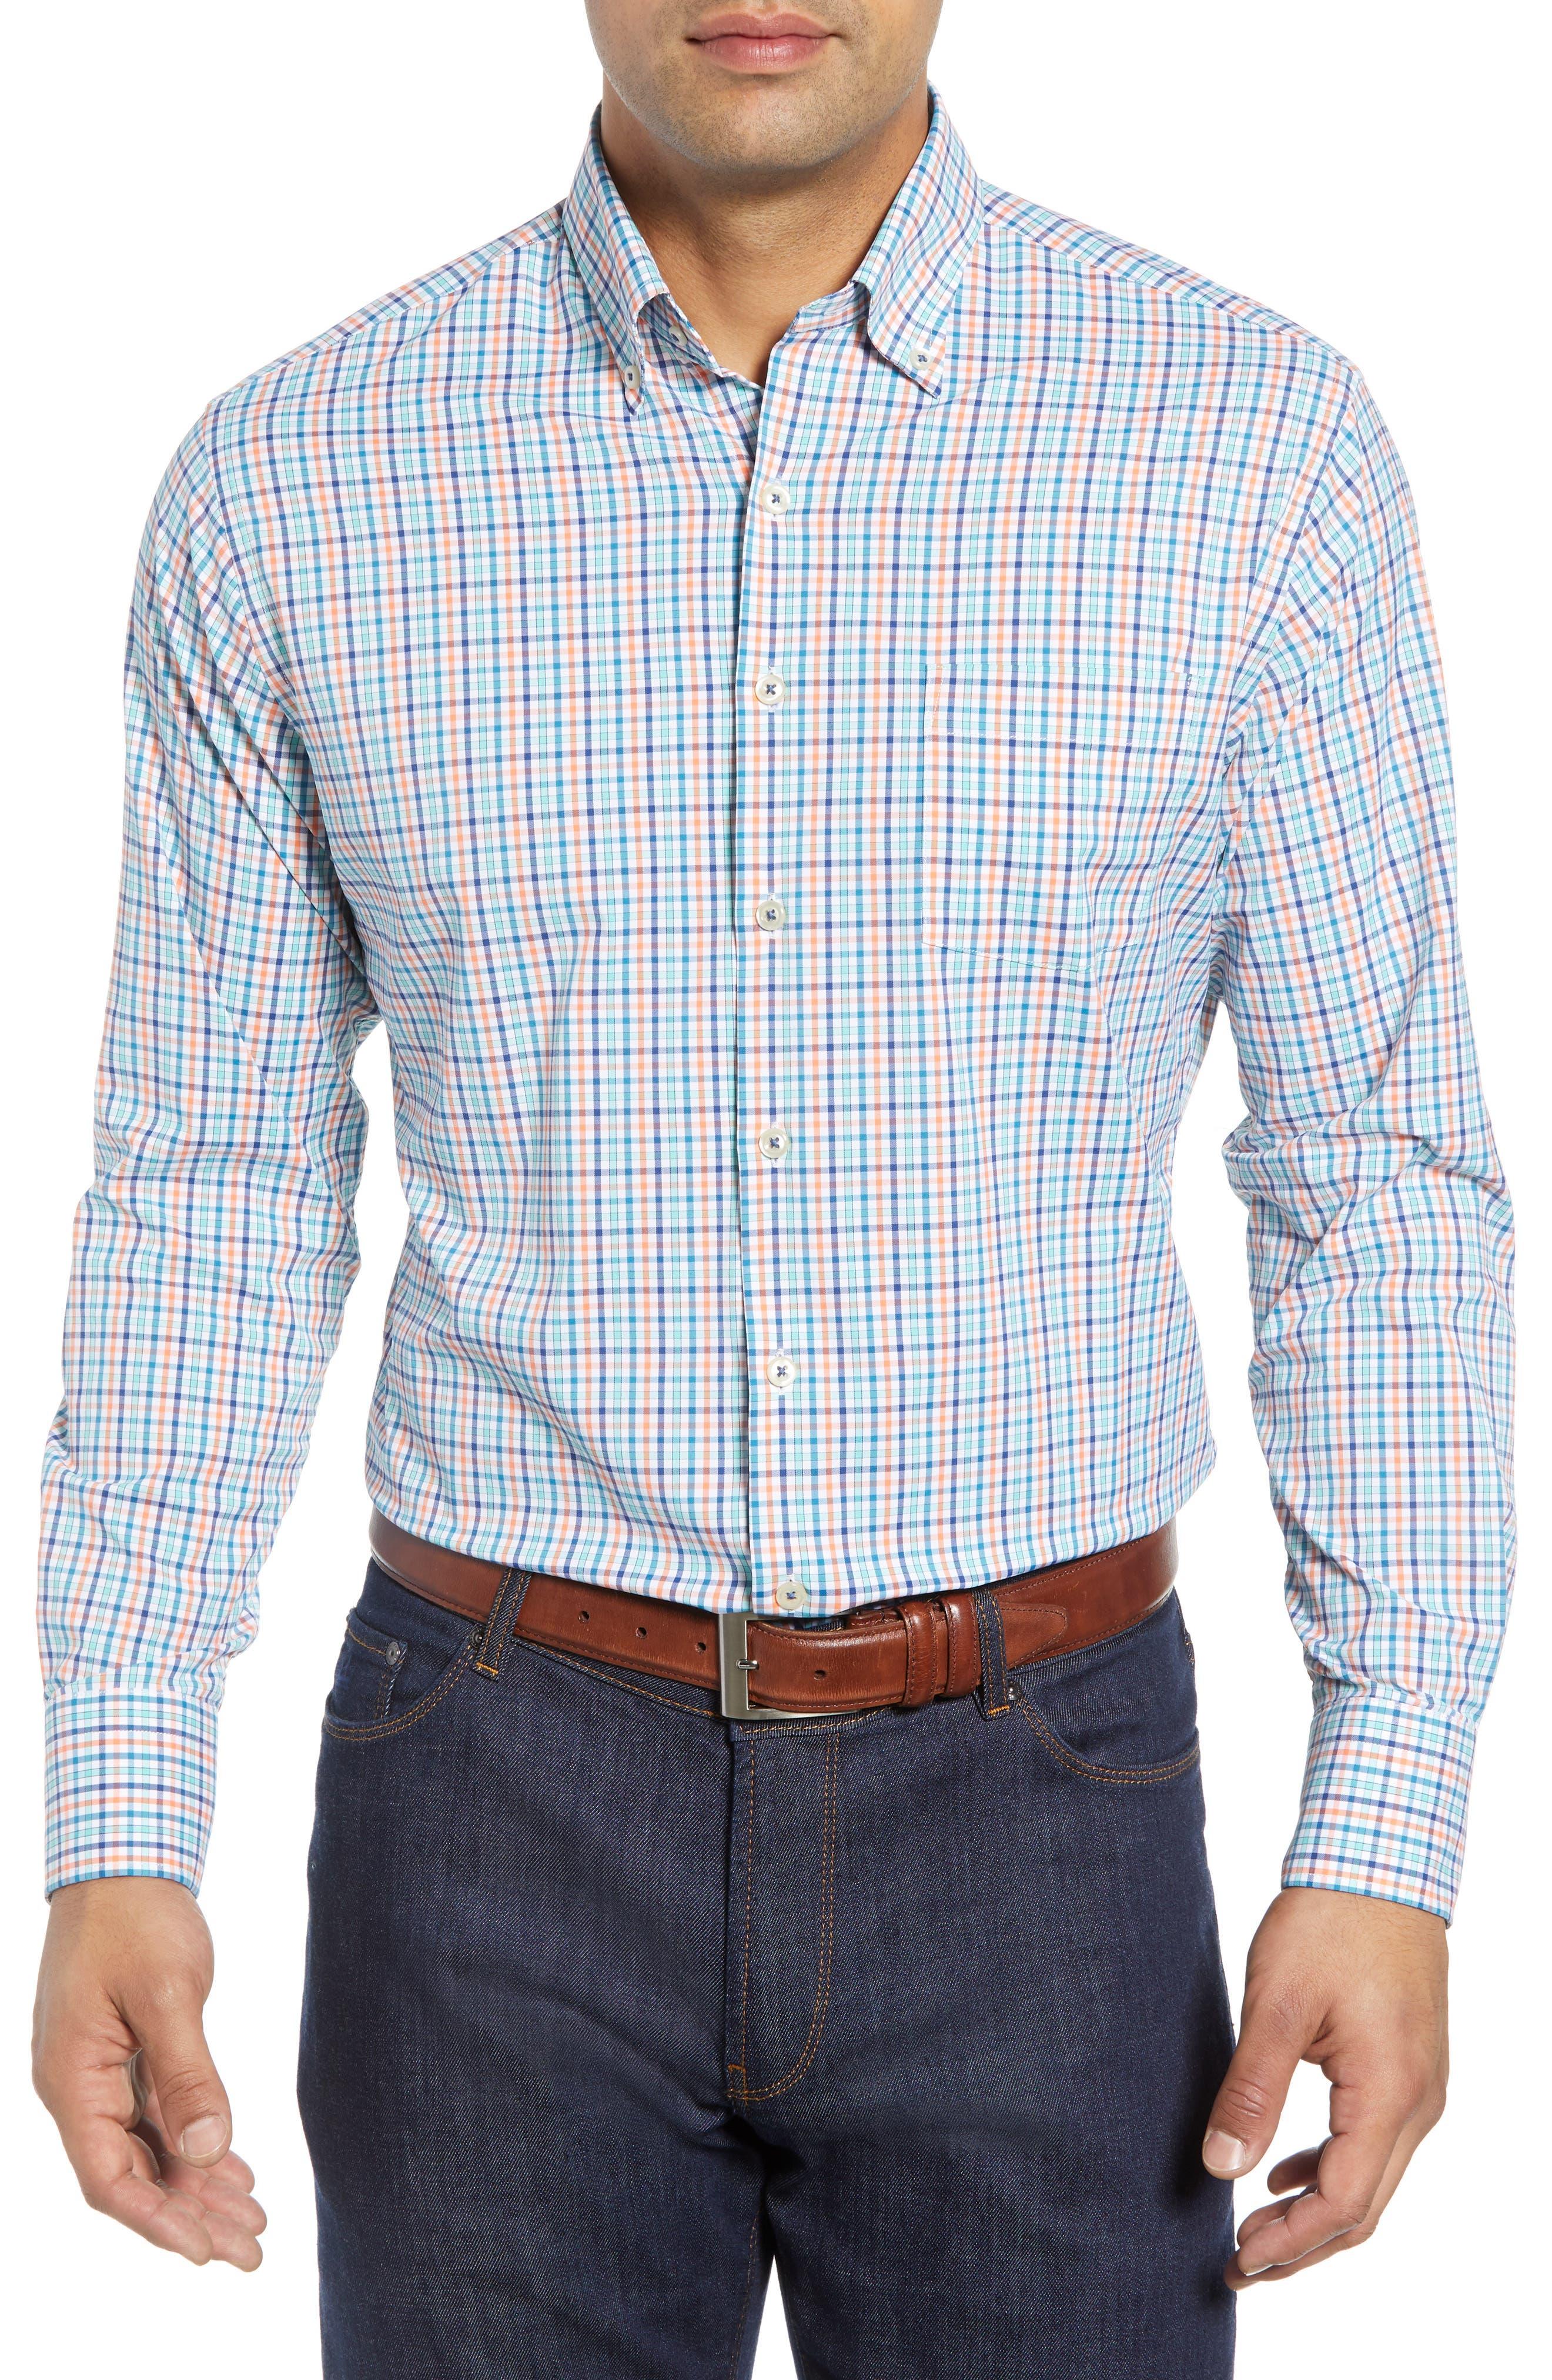 Lawson Regular Fit Tattersall Check Performance Sport Shirt,                             Main thumbnail 1, color,                             BLUE